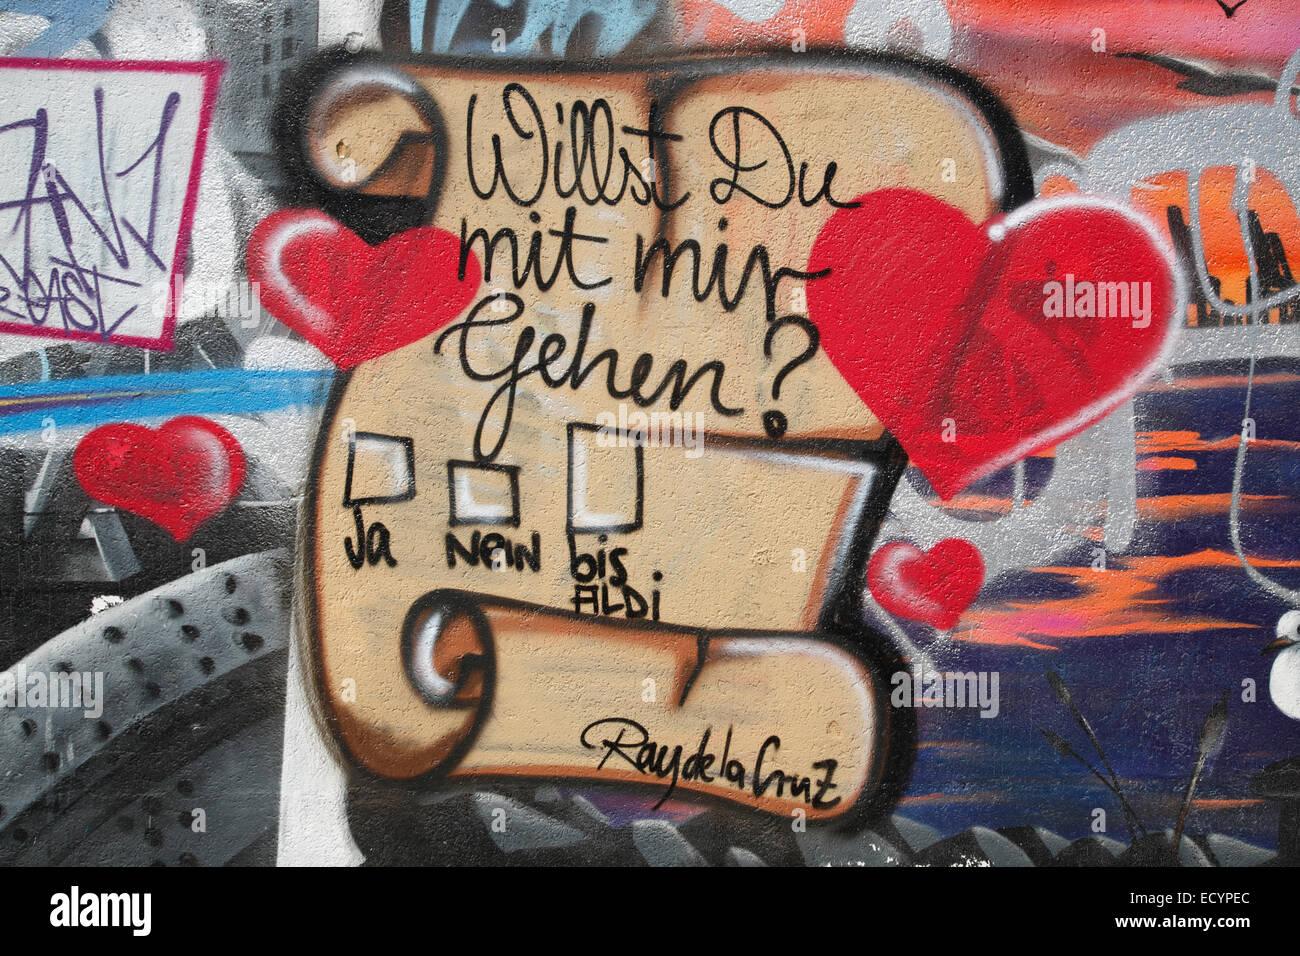 Graffiti, St. Pauli, Hamburg, Germany, Europe - Stock Image